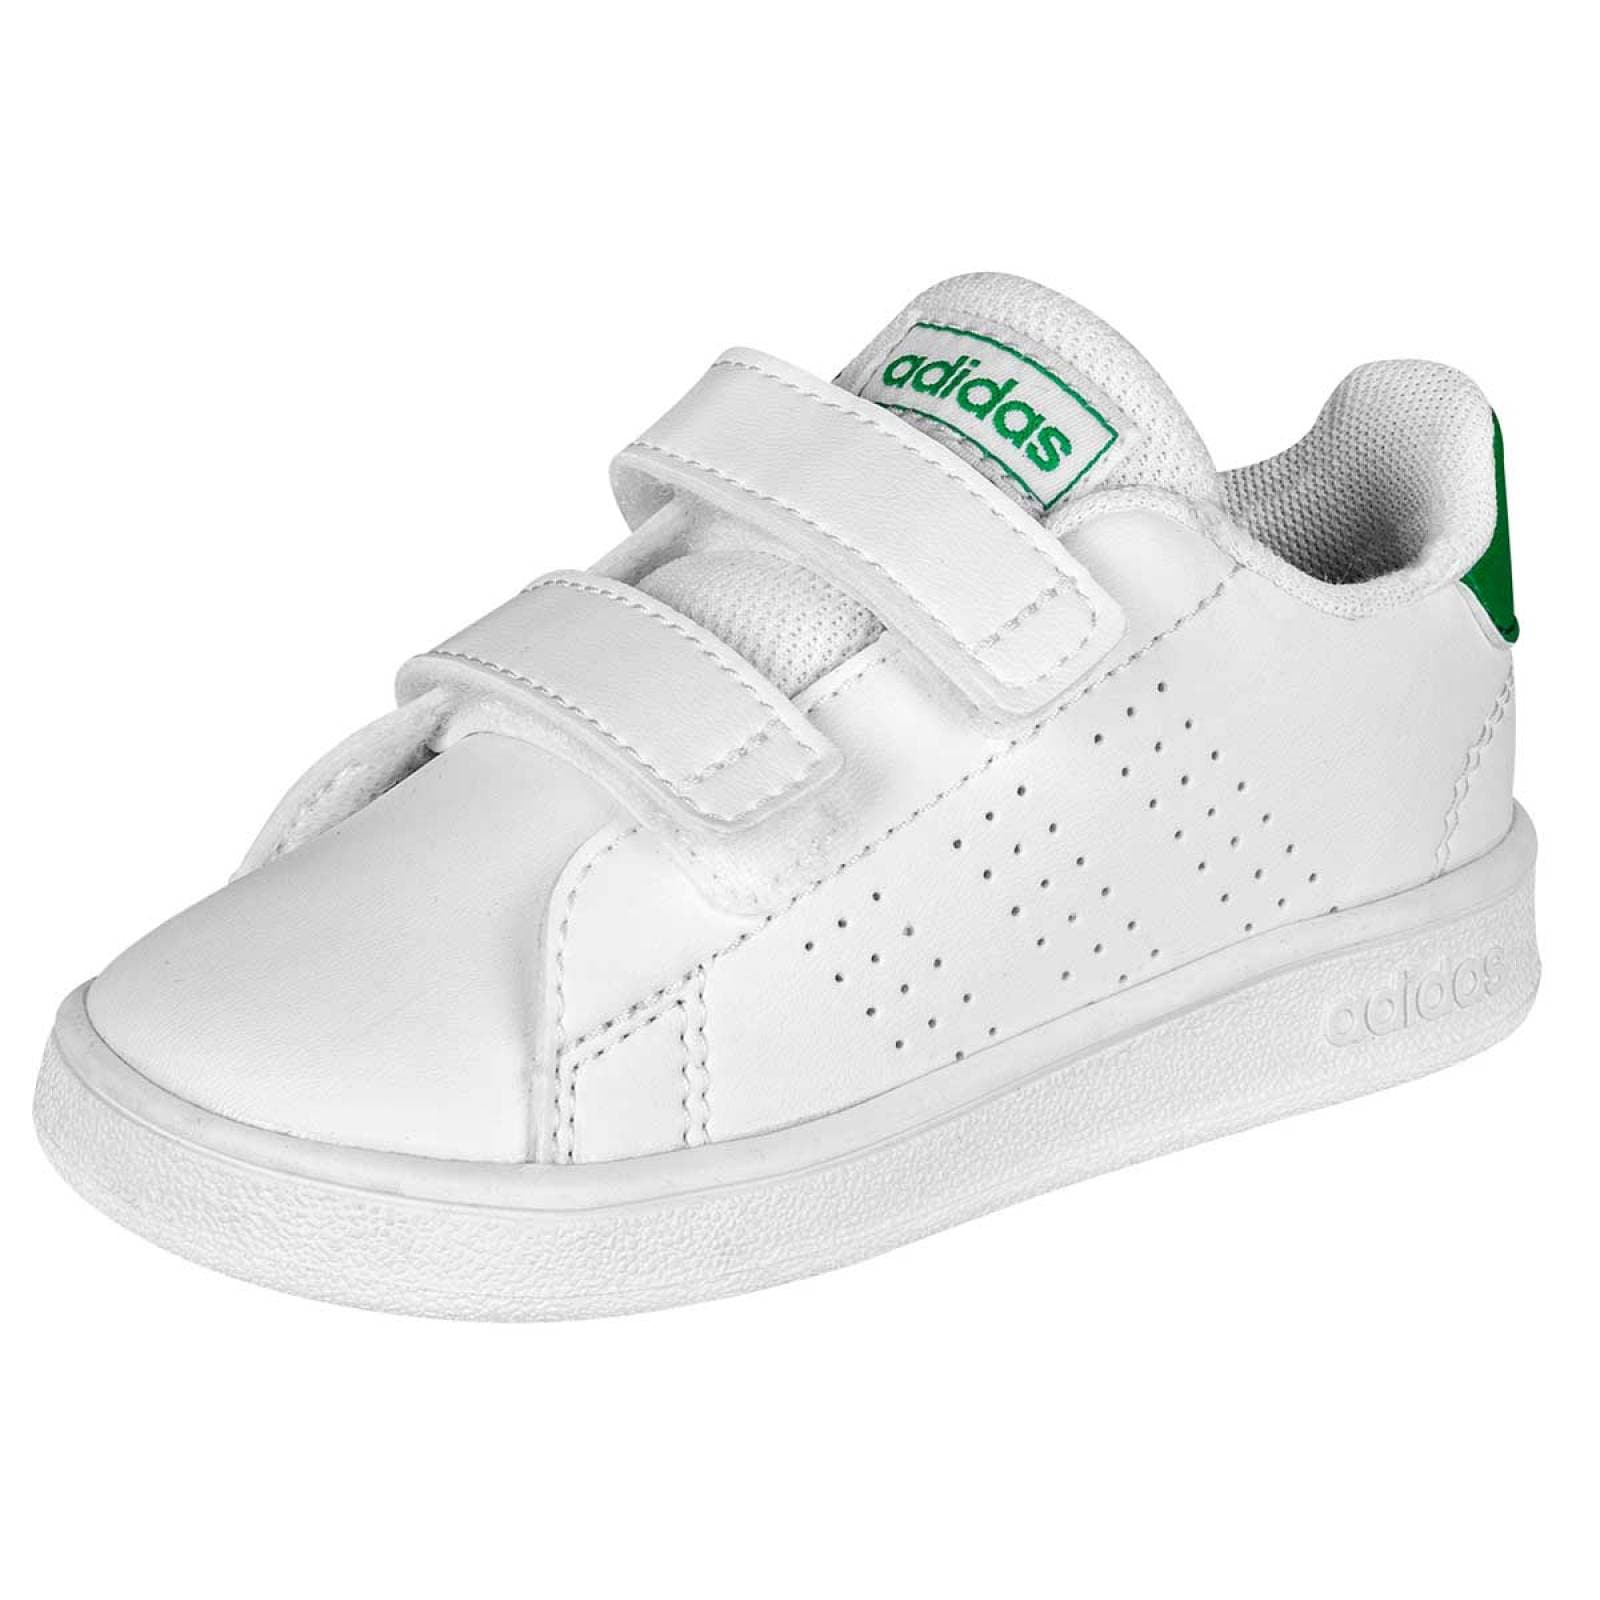 Adidas Tenis Niño bebe Blanco verde